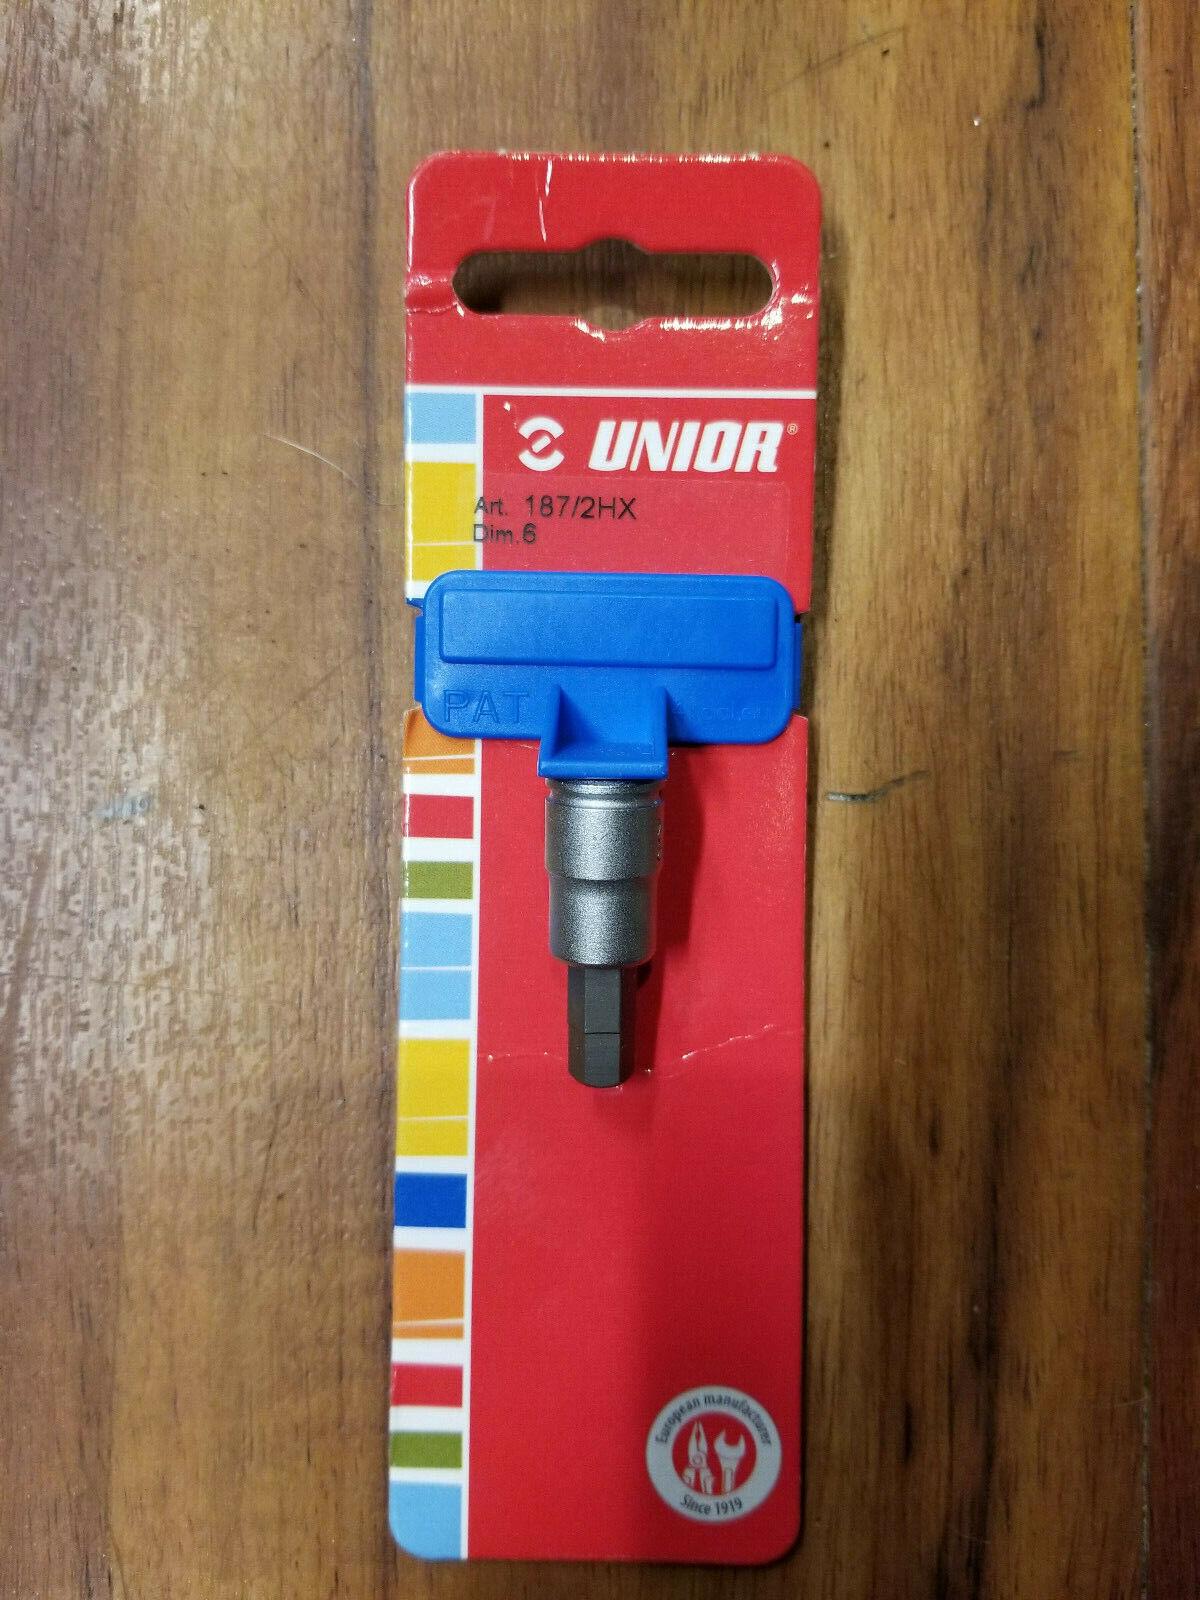 Unior 1//4/″ Drive Metric Hex Bits